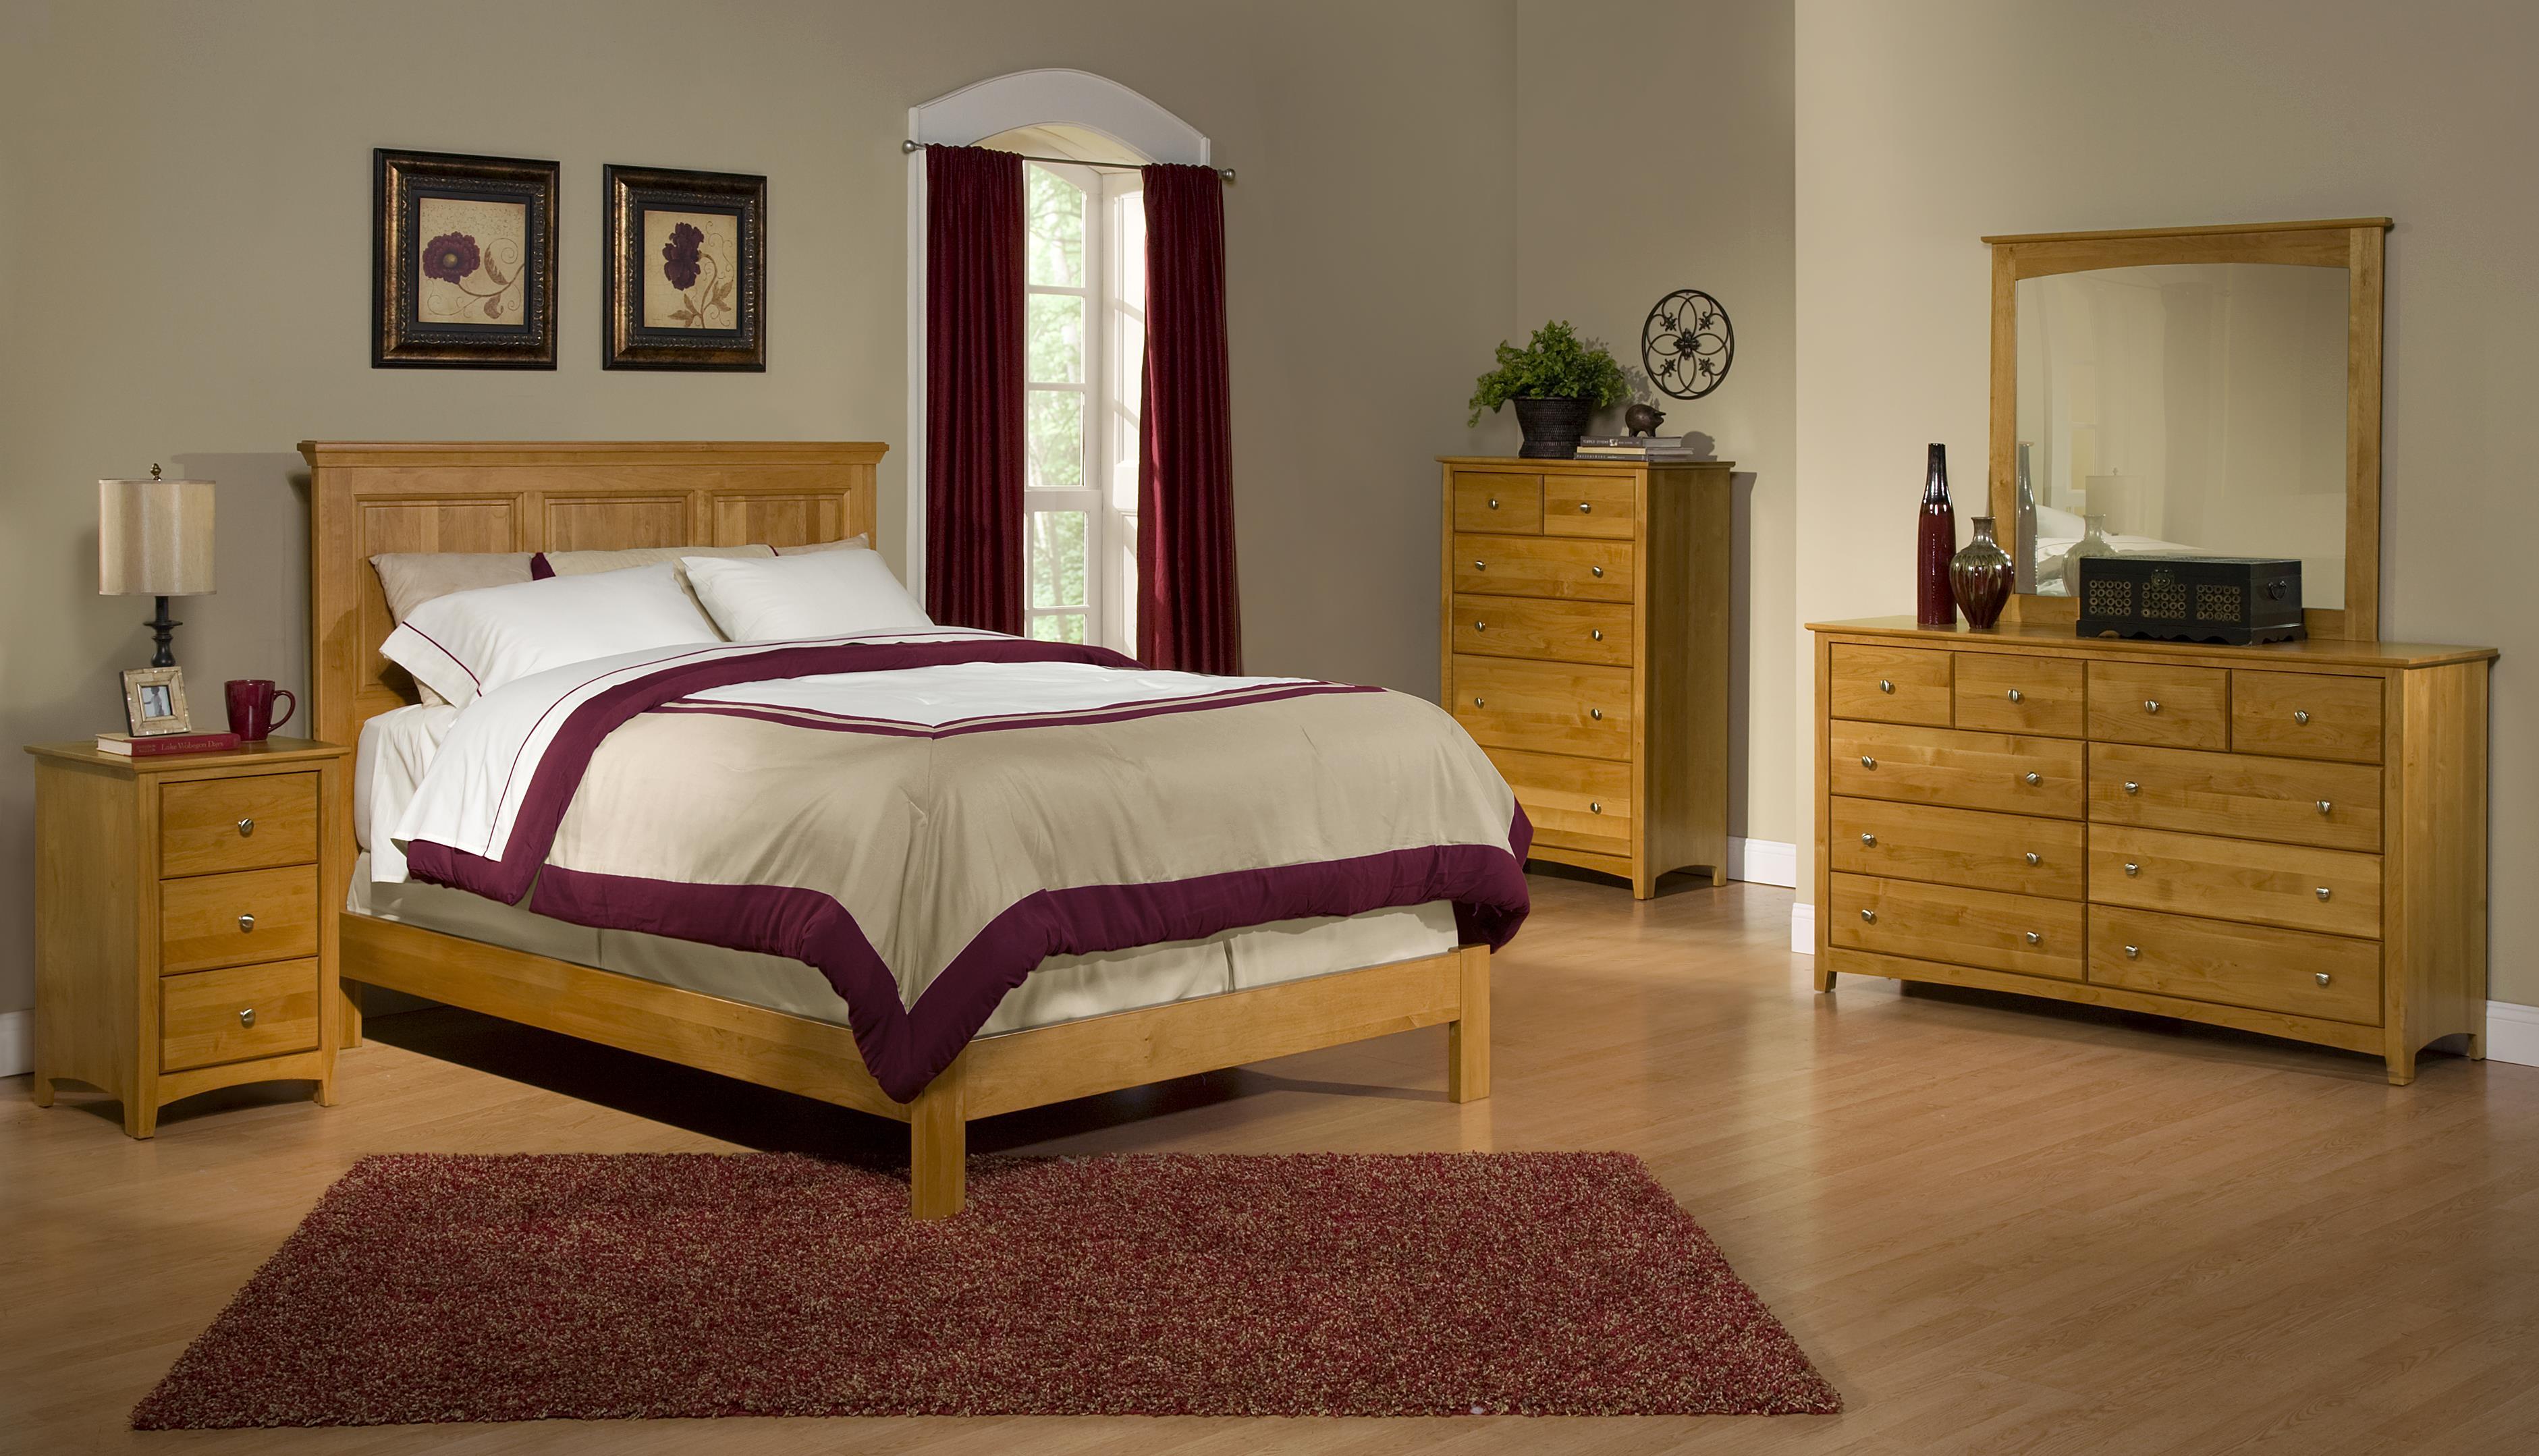 Shaker Bedroom Furniture Archbold Furniture Alder Shaker Queen Flat Panel Chest Bed With 9